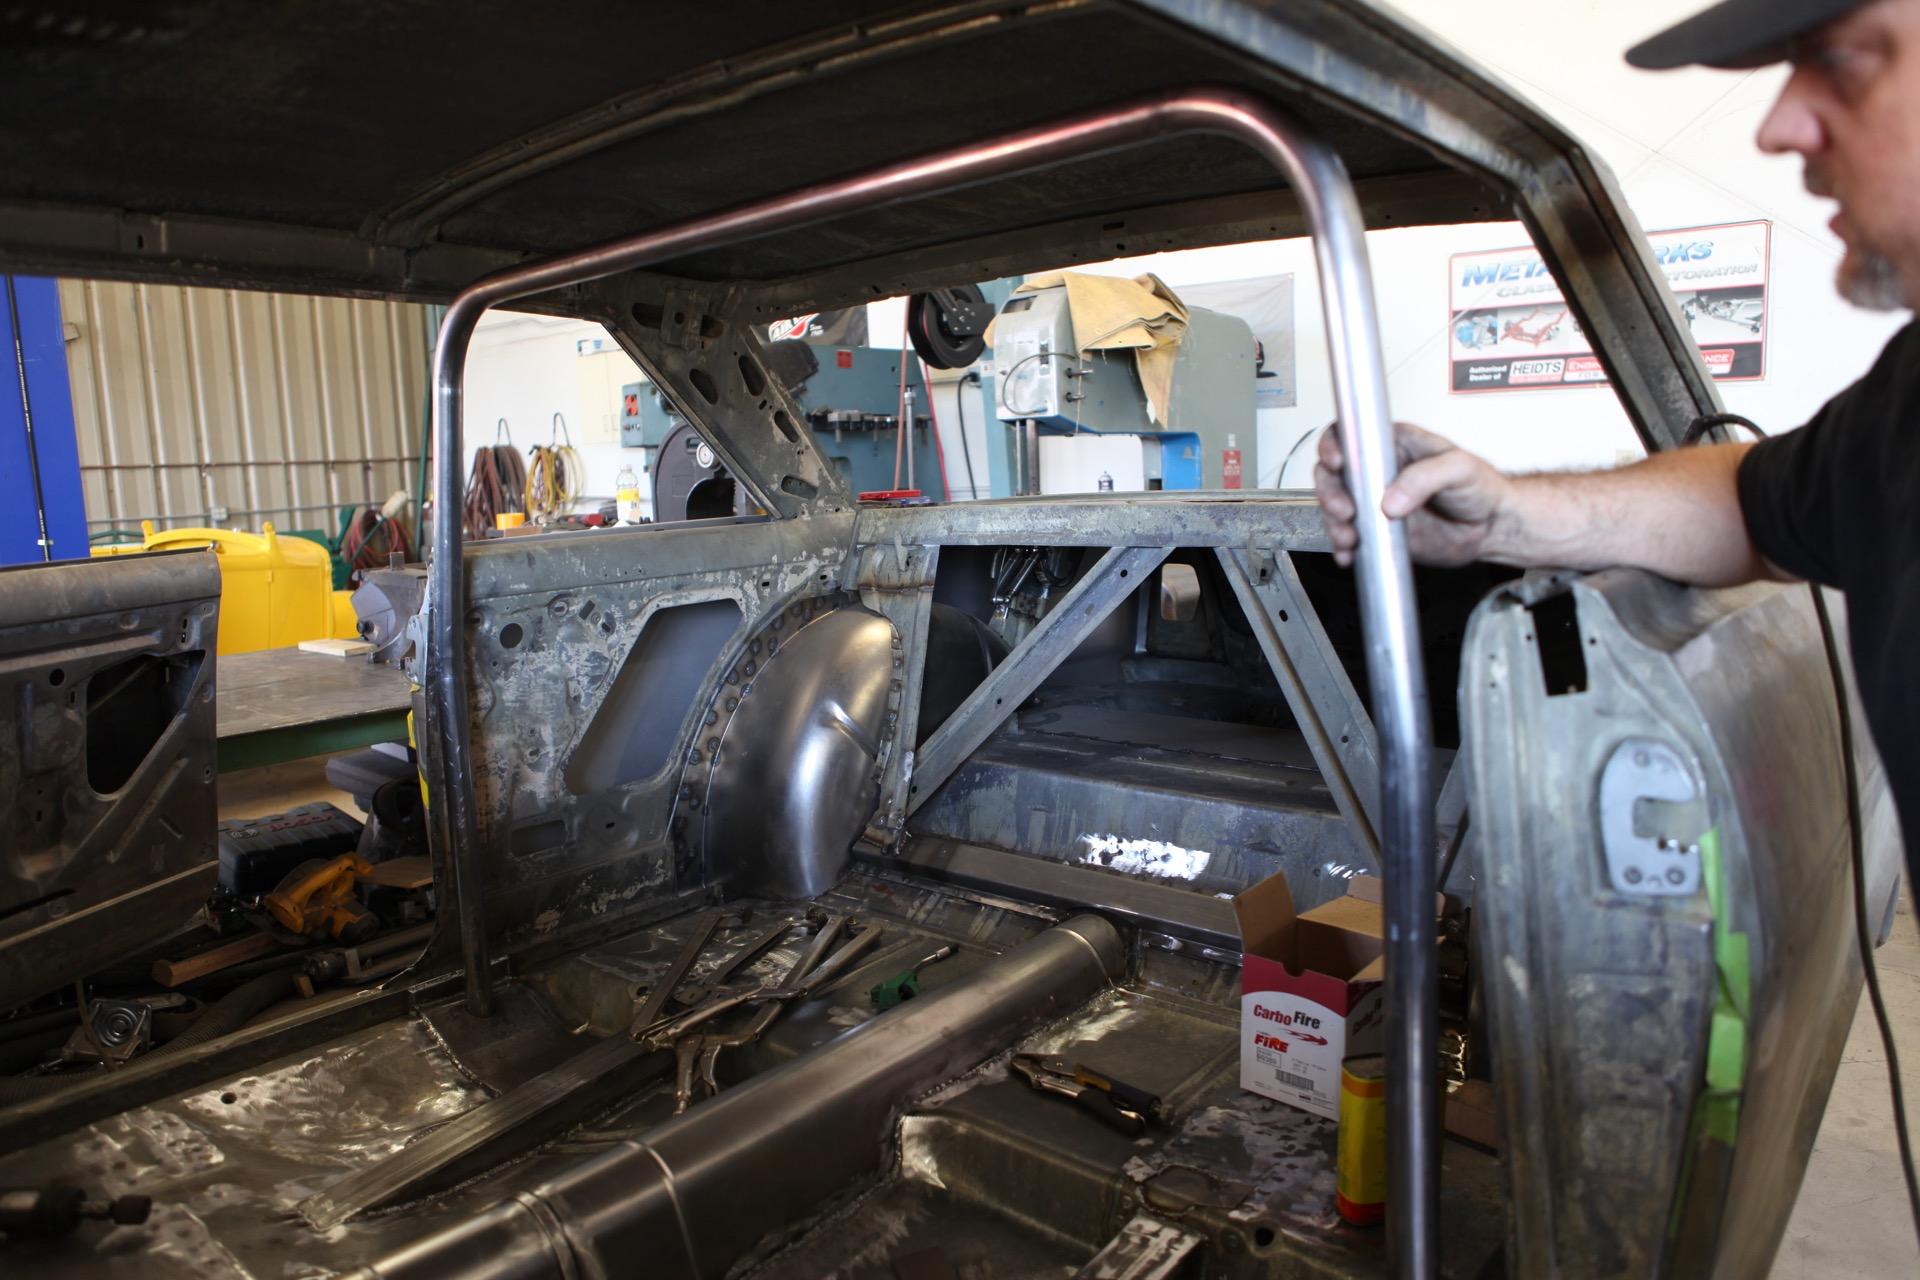 Detroit Roof Repair 1963 Pro Touring Chevy Nova – MetalWorks Classic Auto ...